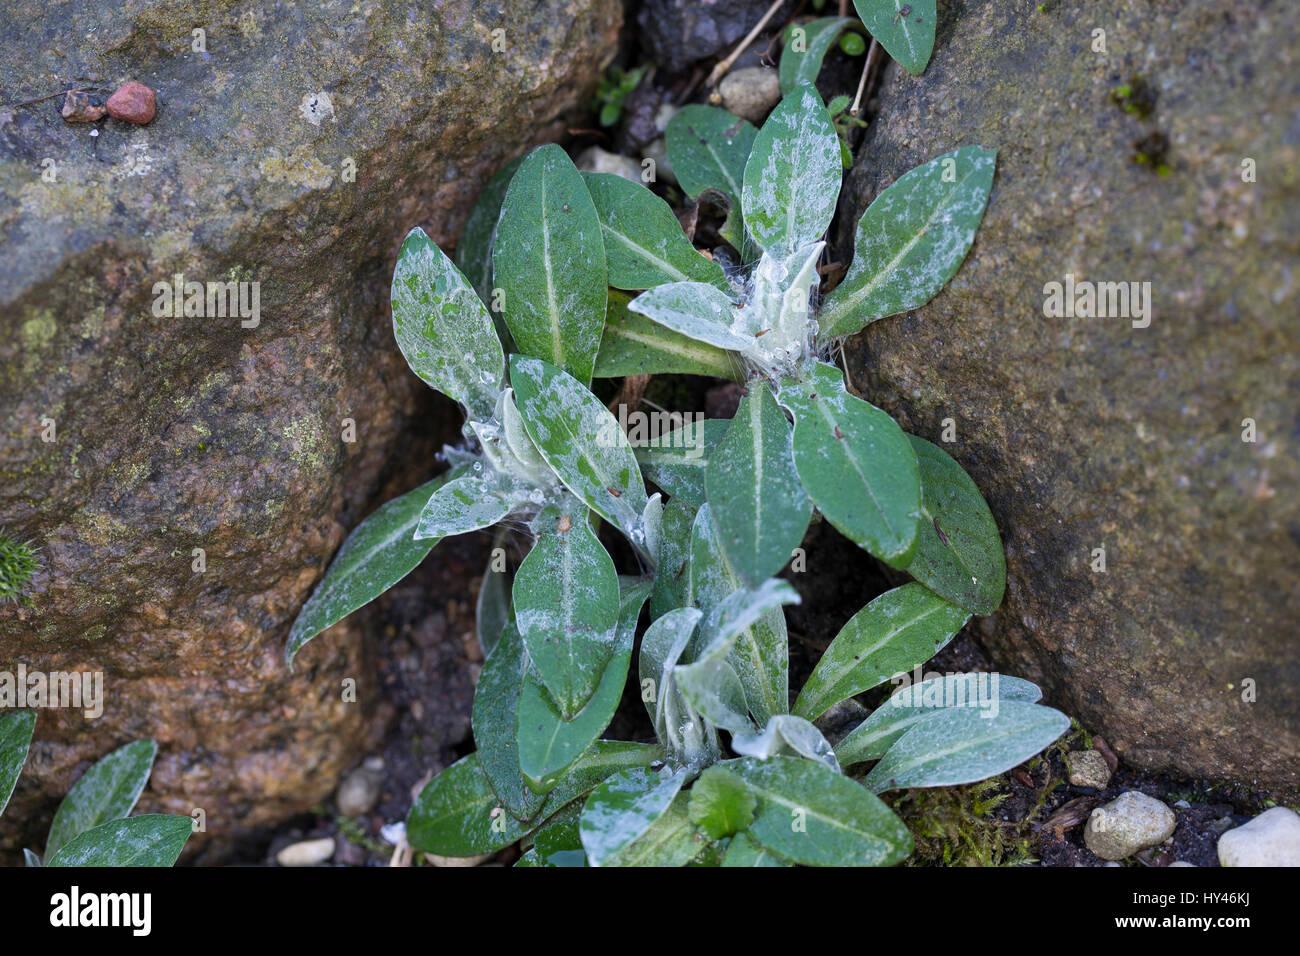 Berg-Flockenblume, Bergflockenblume, Blatt, Blätter, Blattrosette, Centaurea montana, perenne, fiordaliso fiordaliso Immagini Stock